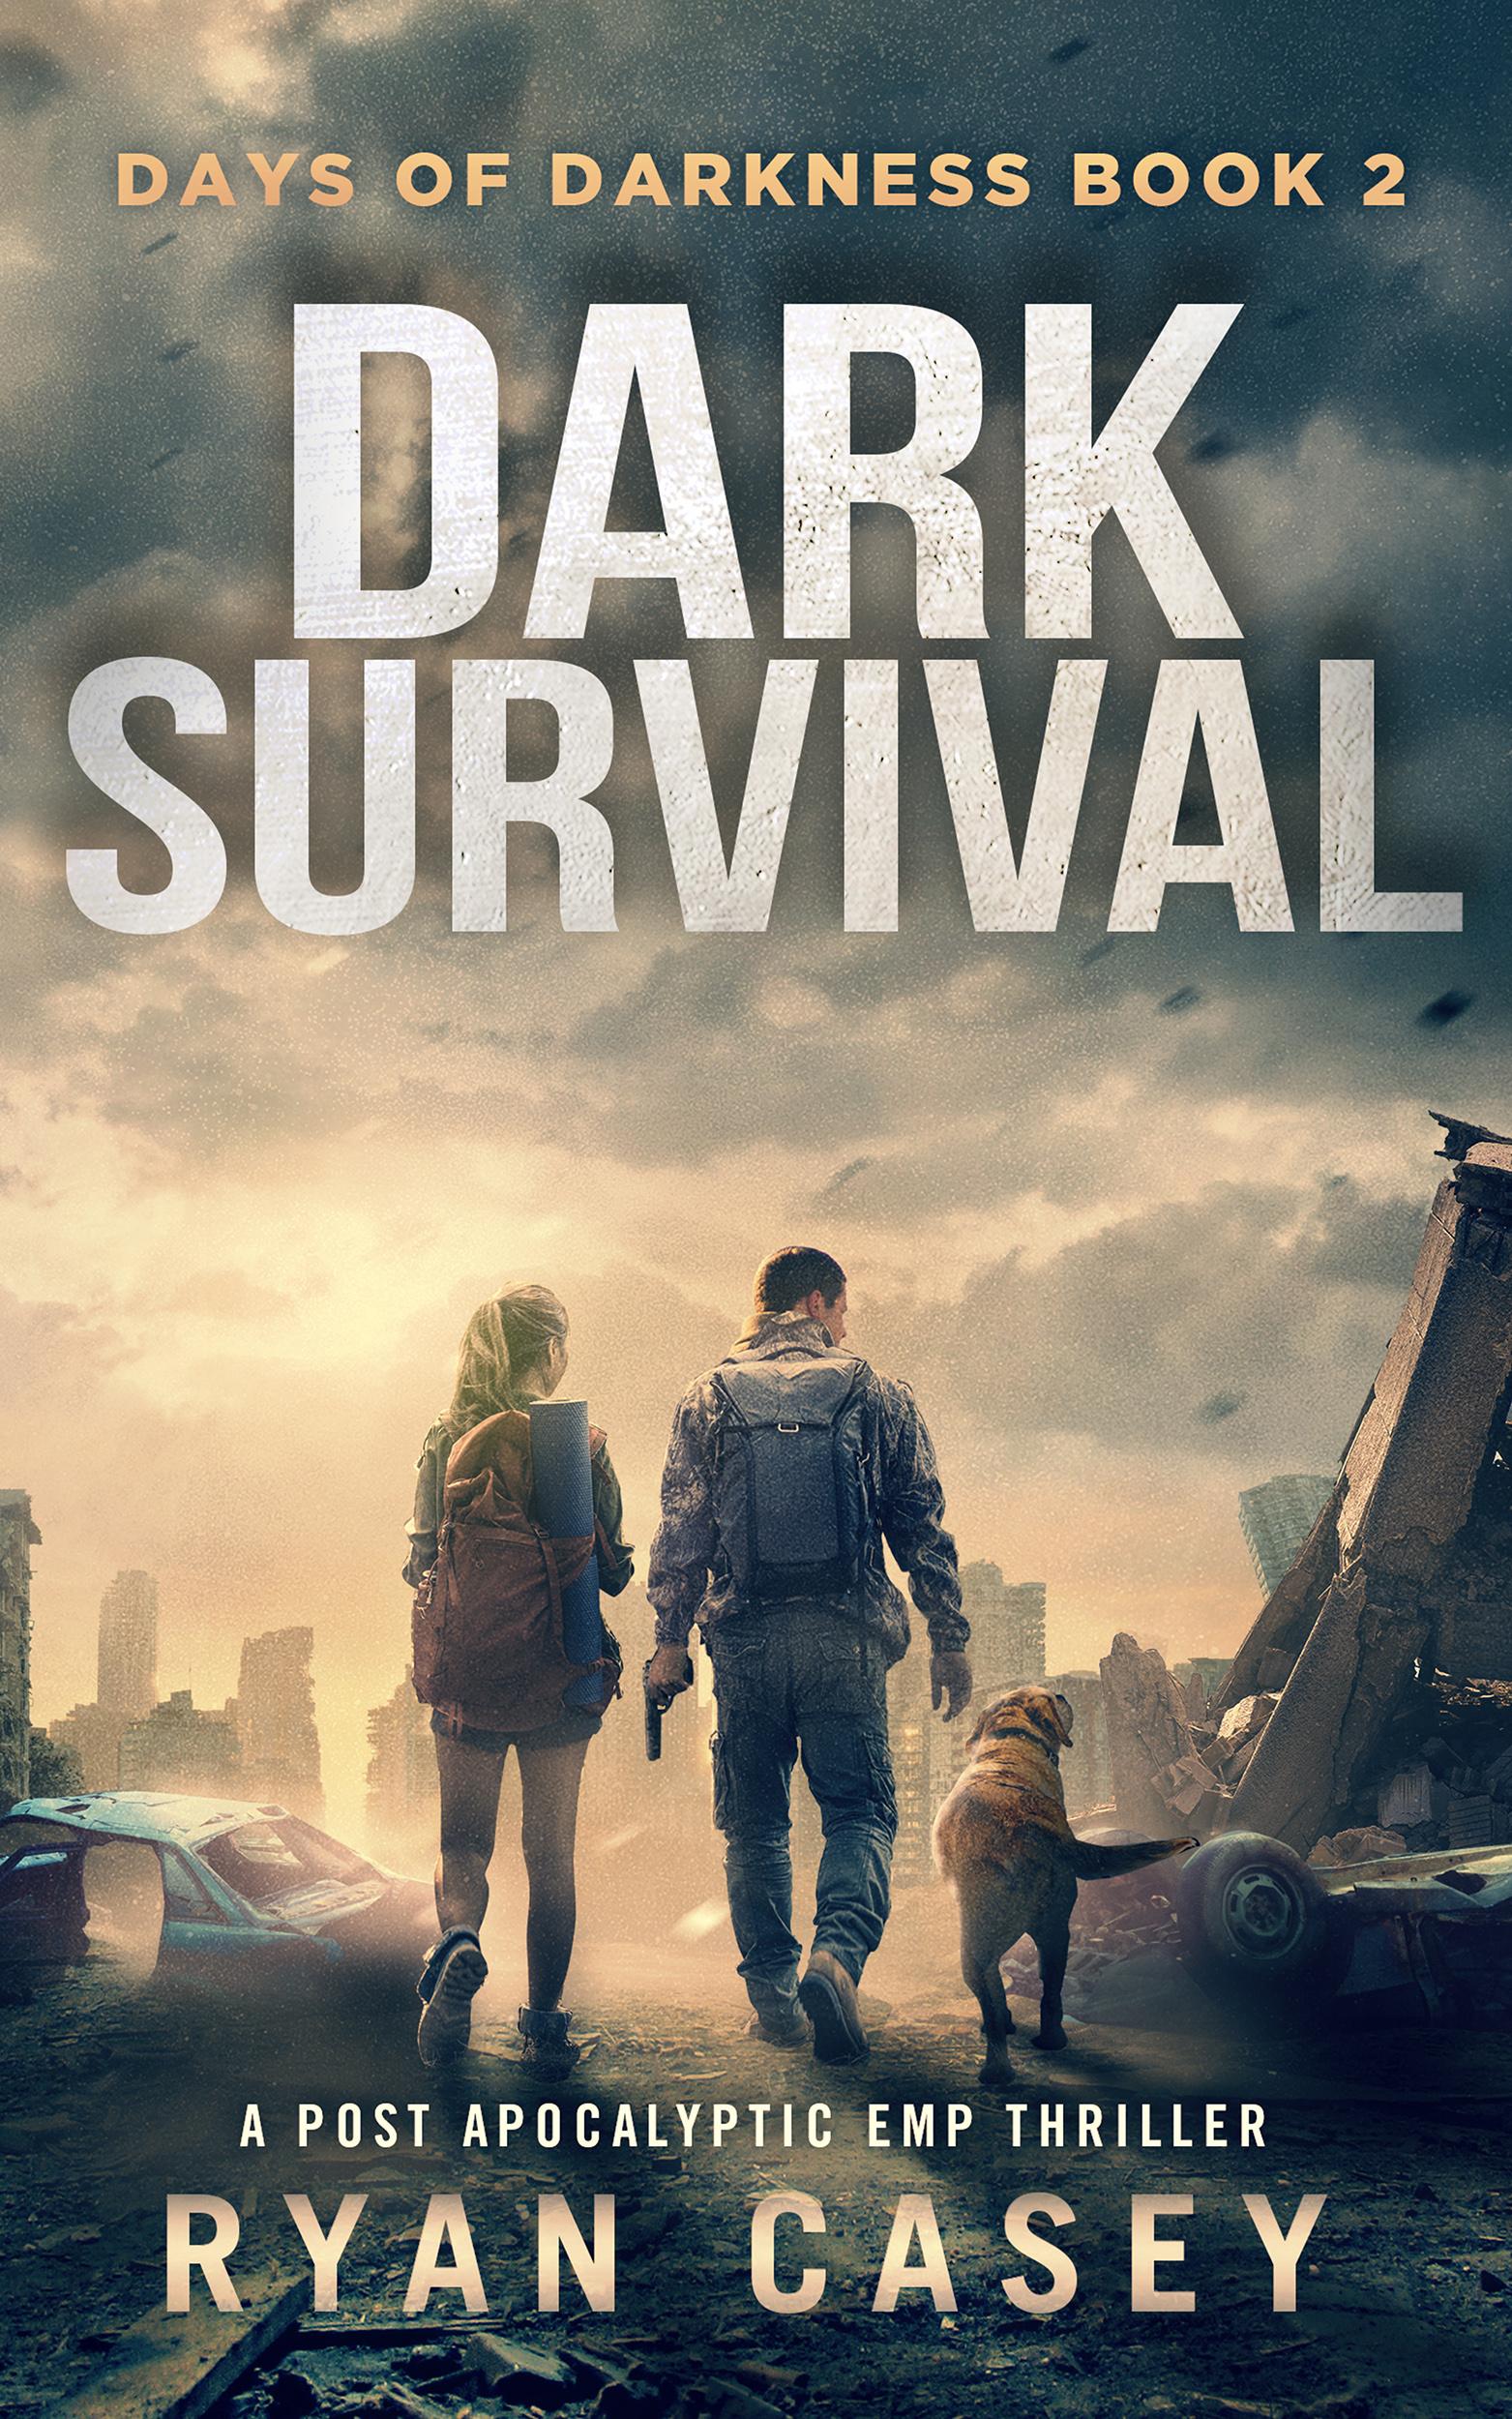 When Darkness Falls: Book 3